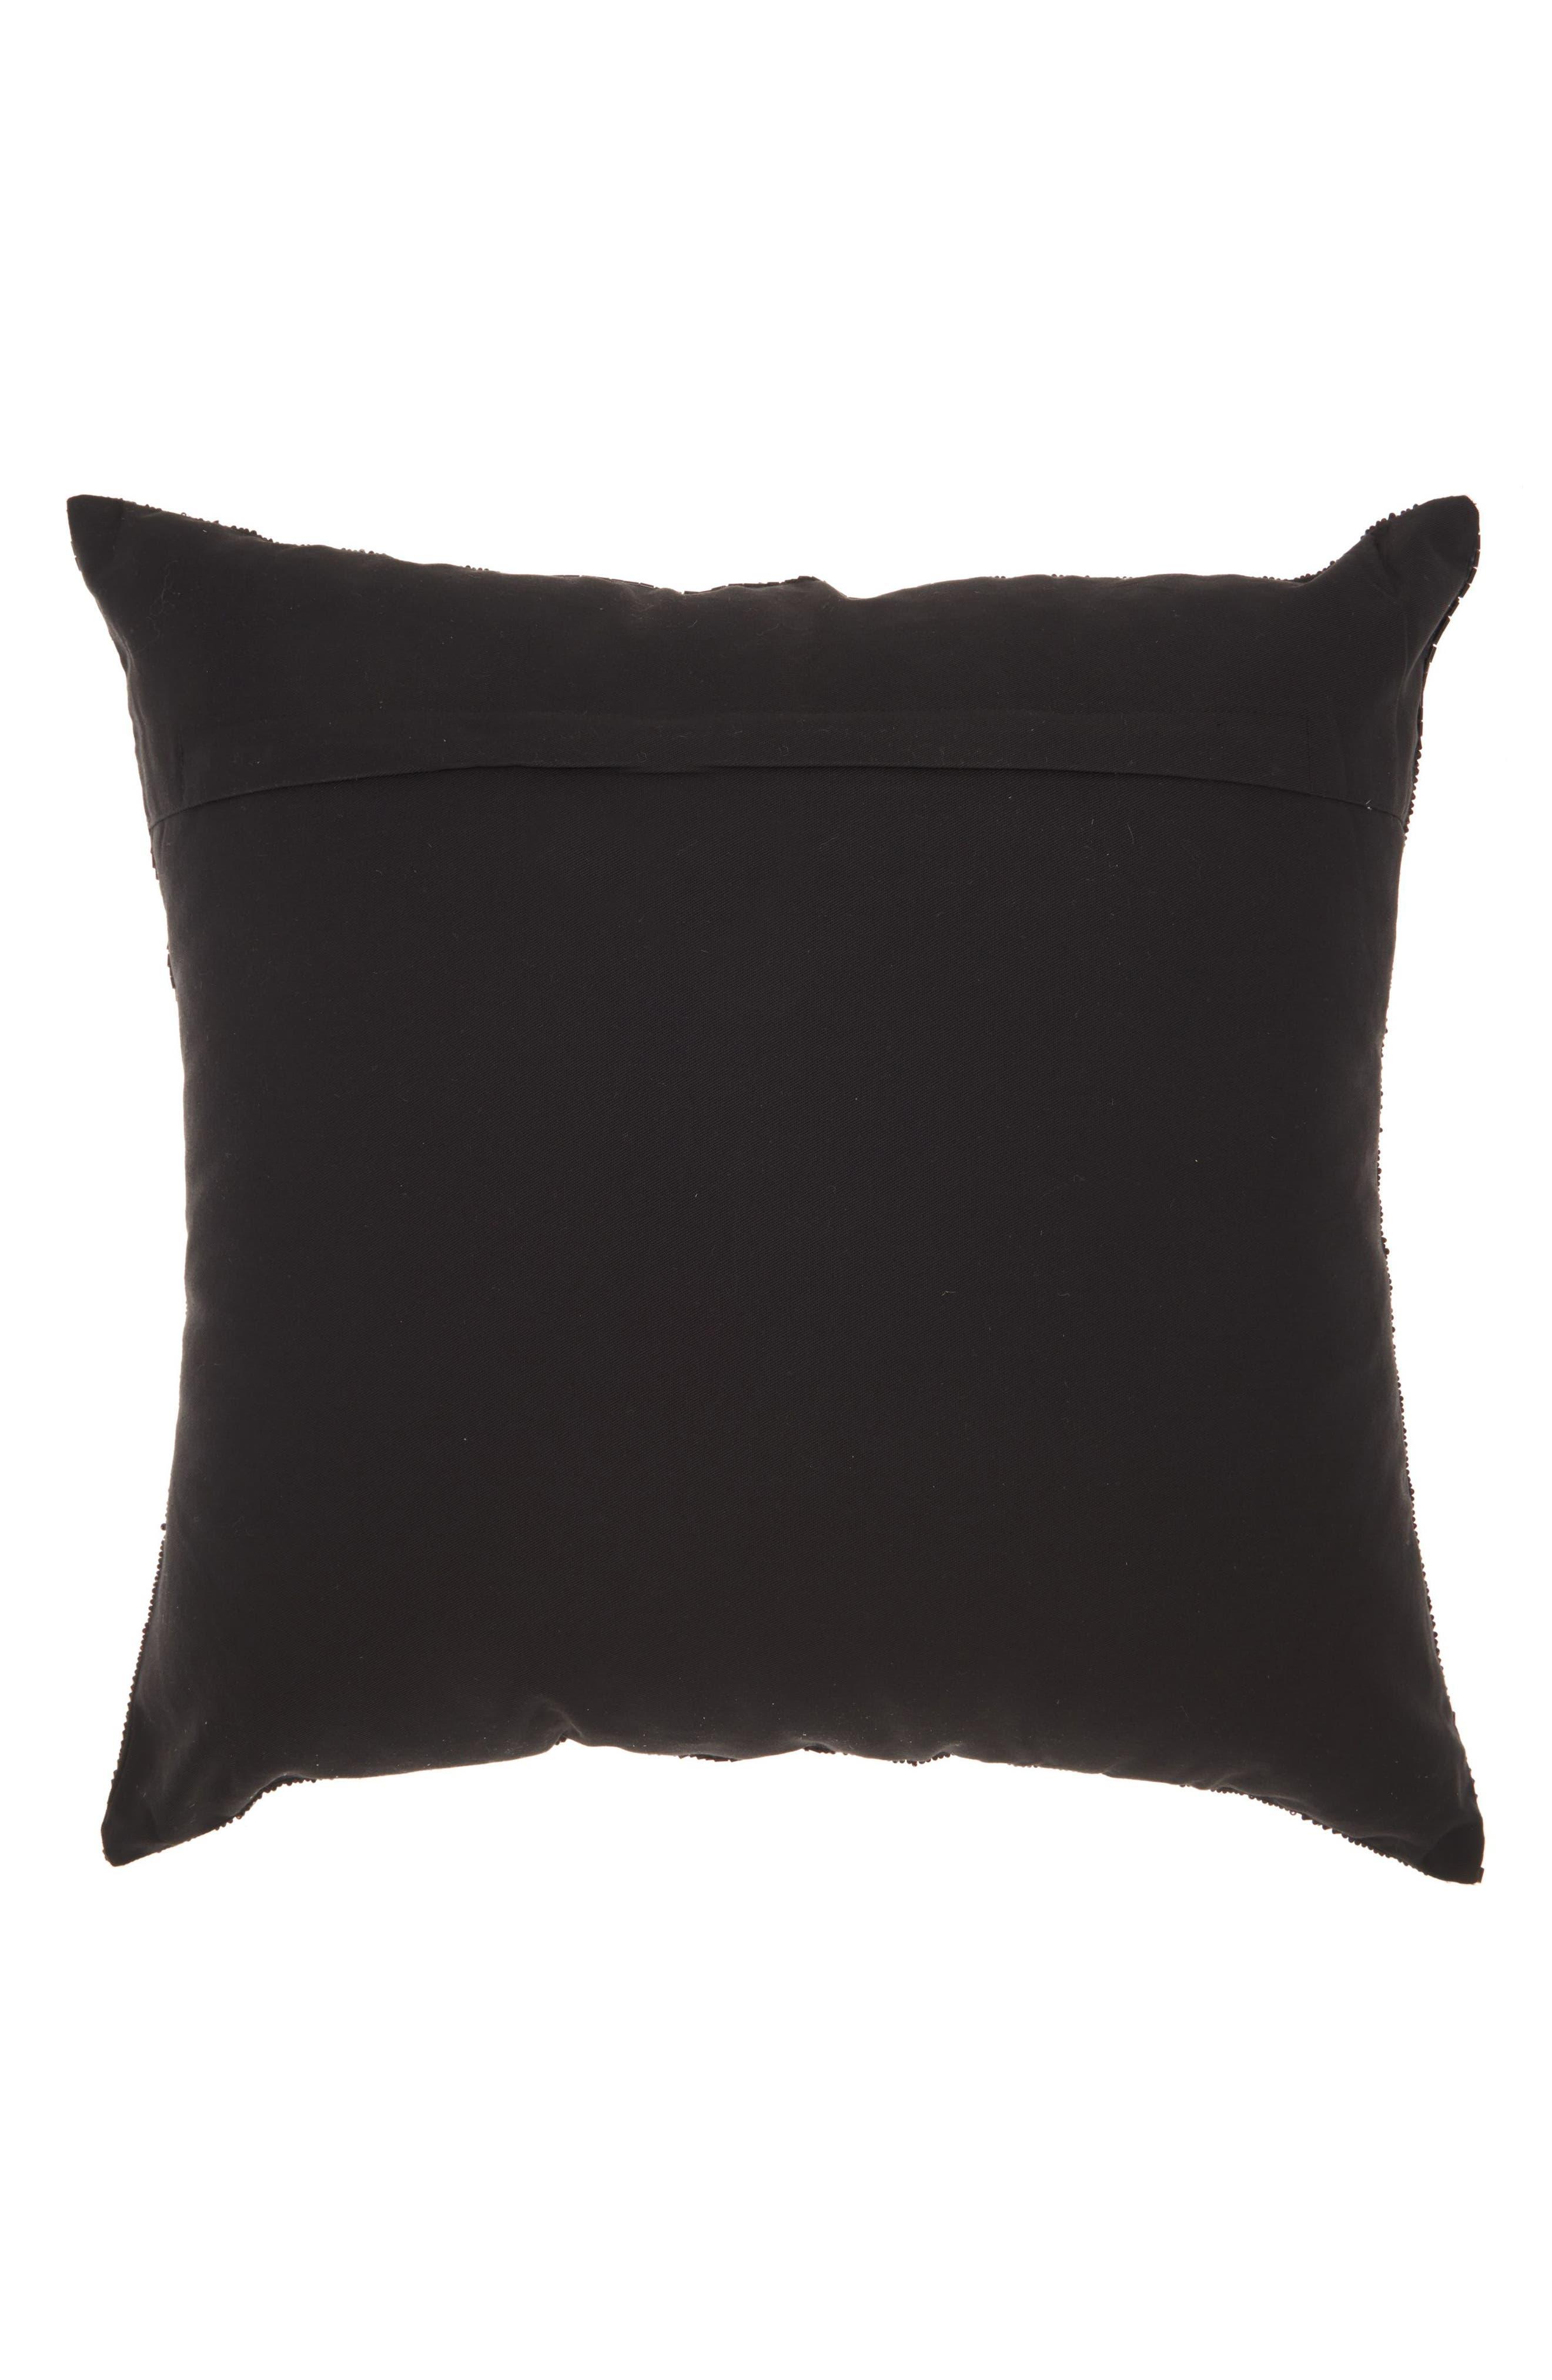 Beaded Fan Pillow,                             Alternate thumbnail 2, color,                             001